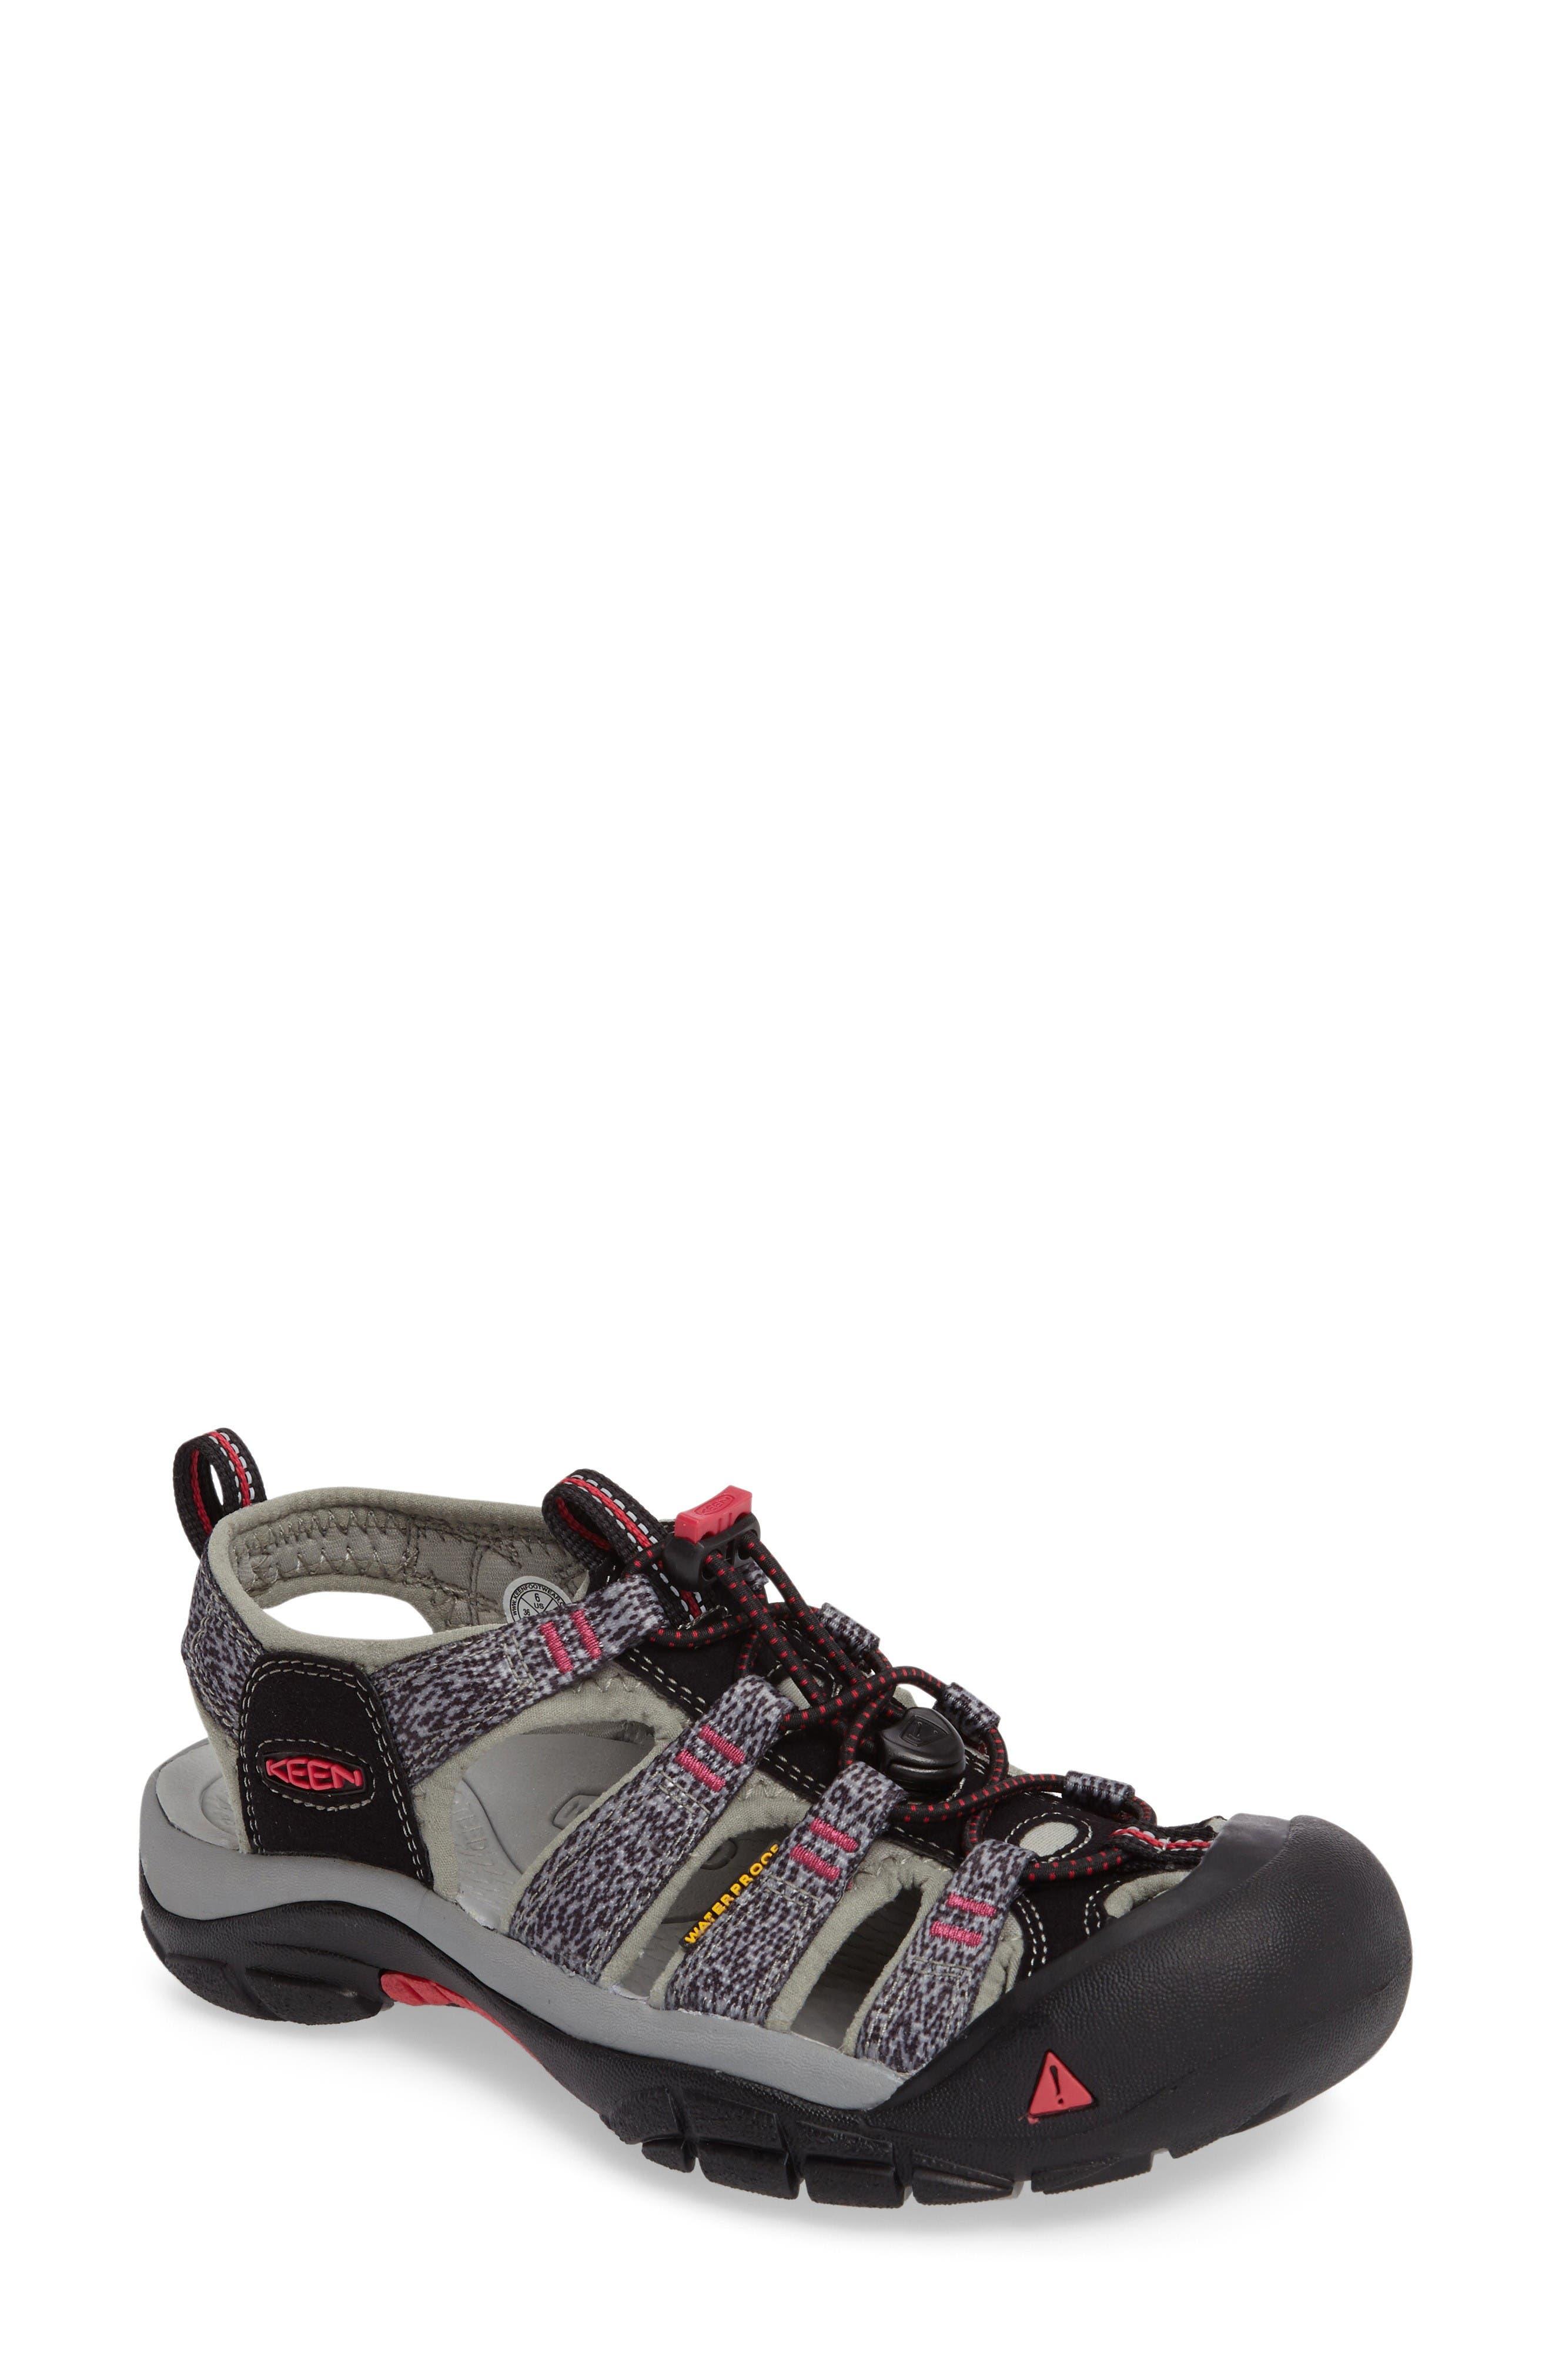 'Newport H2' Sandal,                         Main,                         color, Black/ Bright Rose Fabric